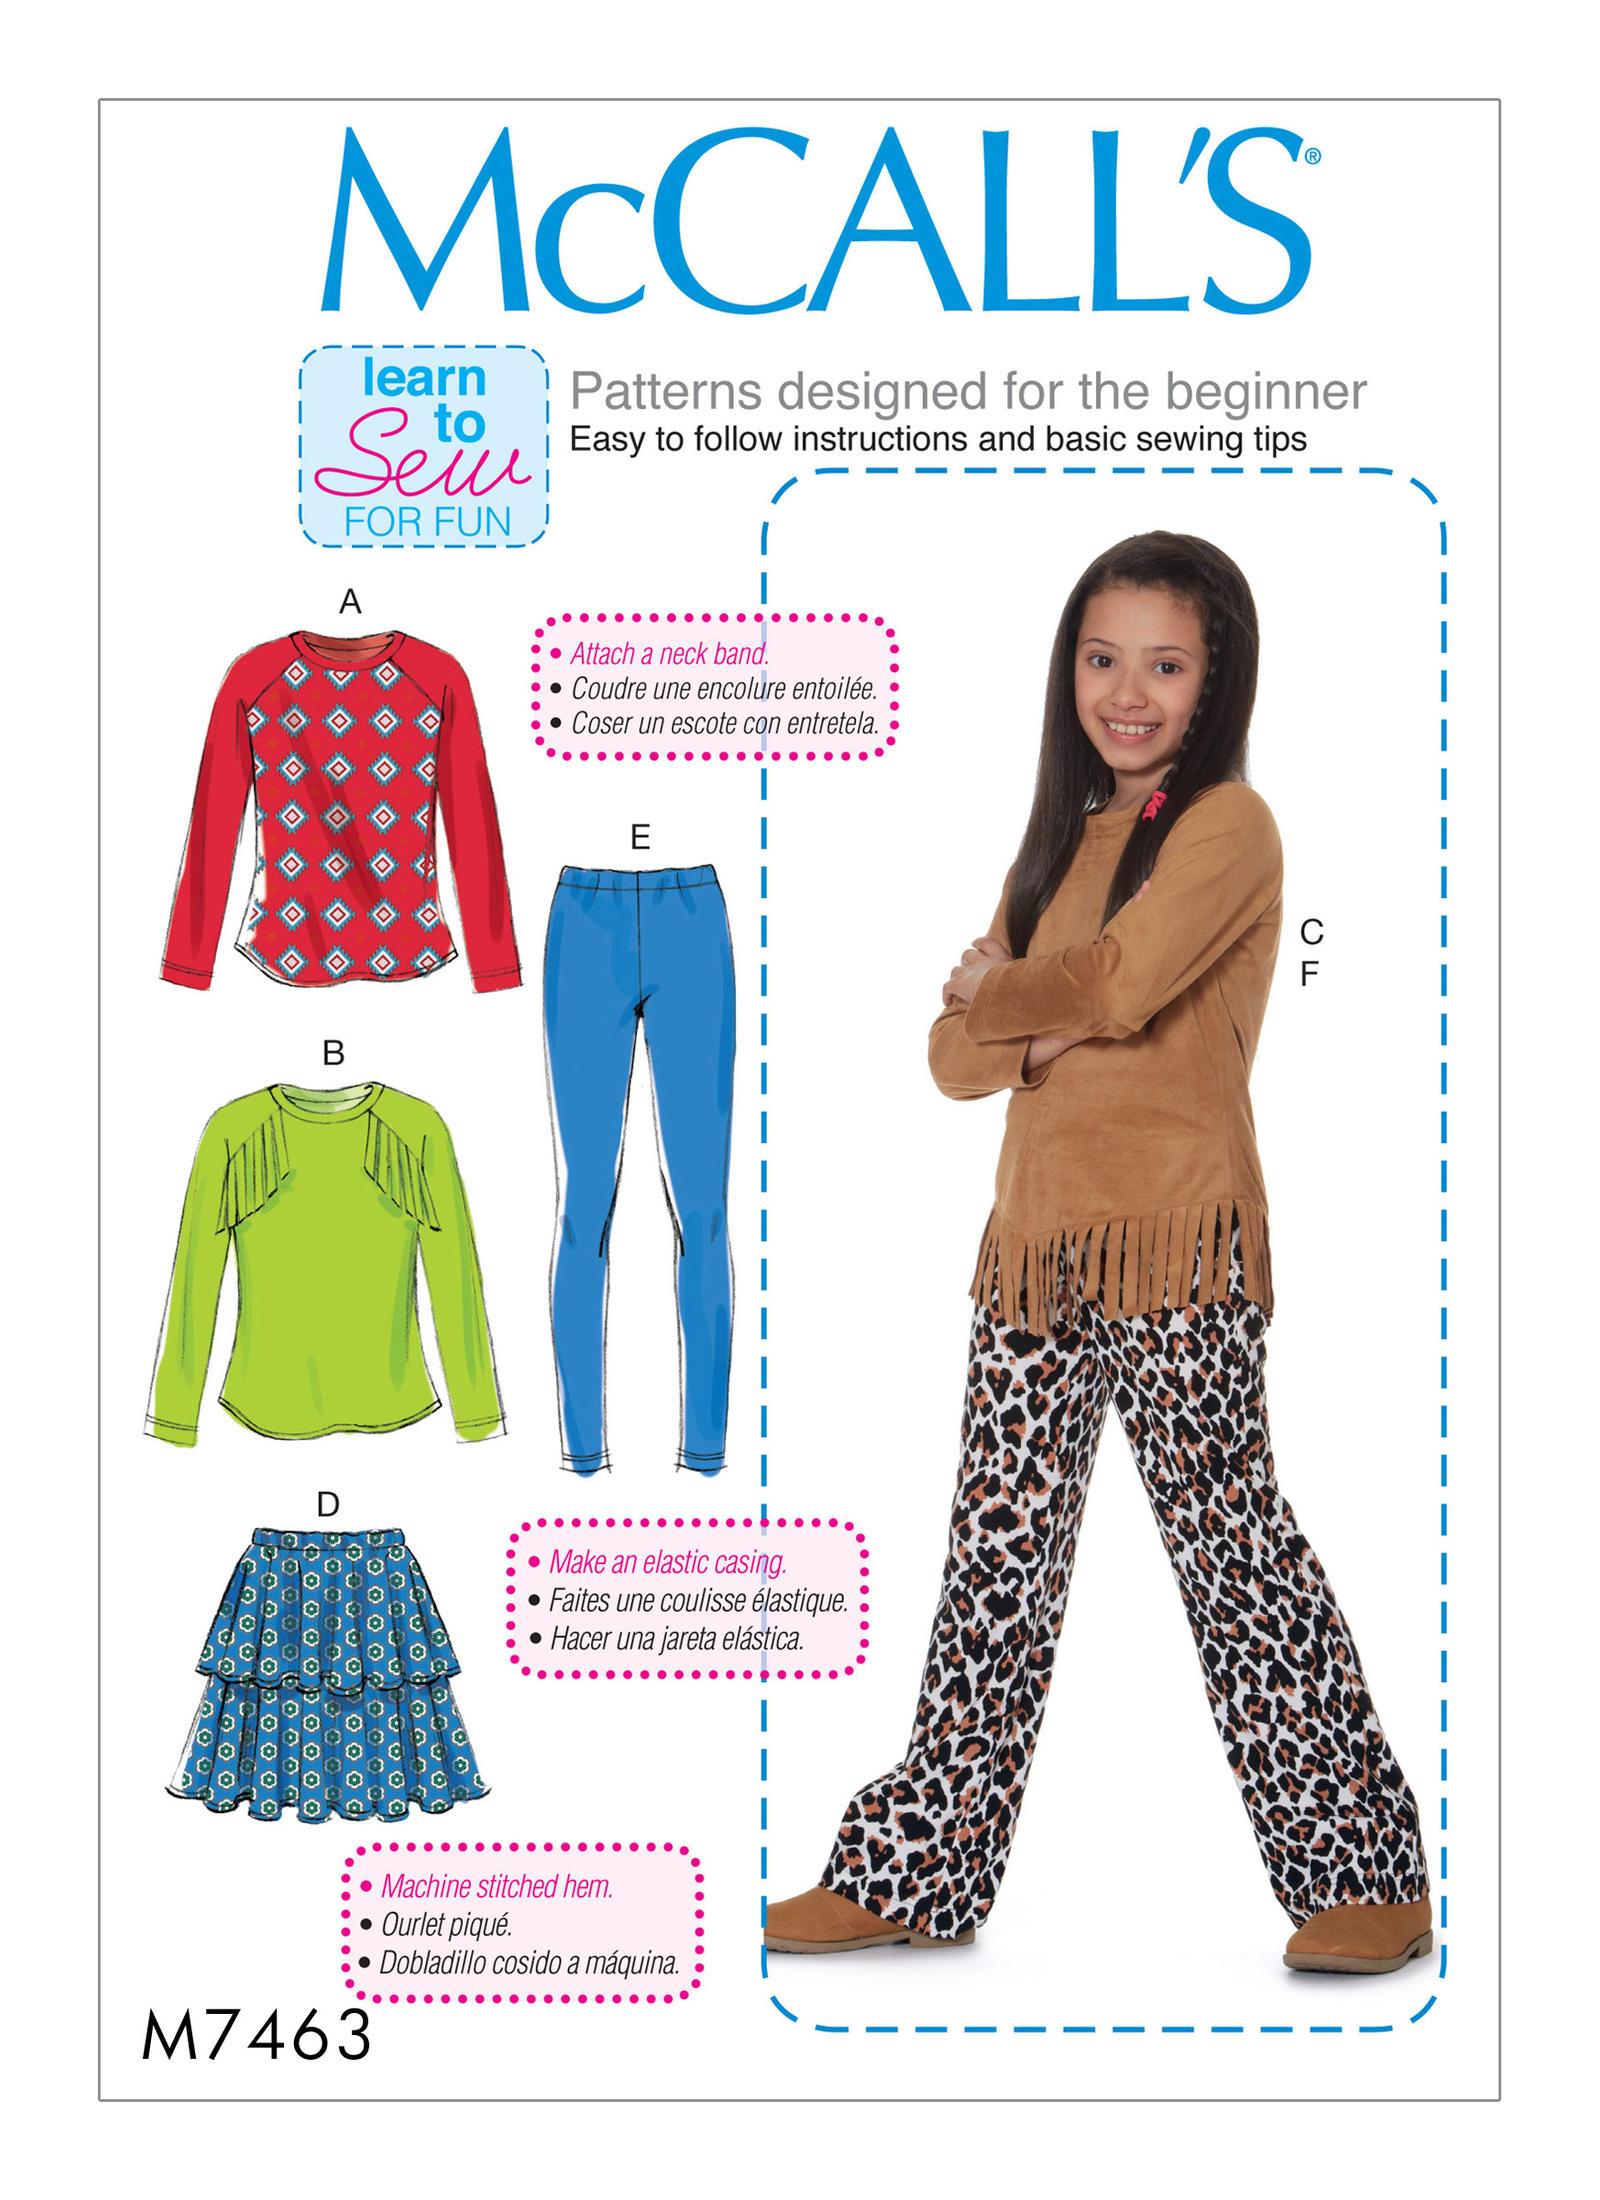 Mccalls 7463 girlsgirls plus raglan sleeve tops tiered skirt prevnext jeuxipadfo Images